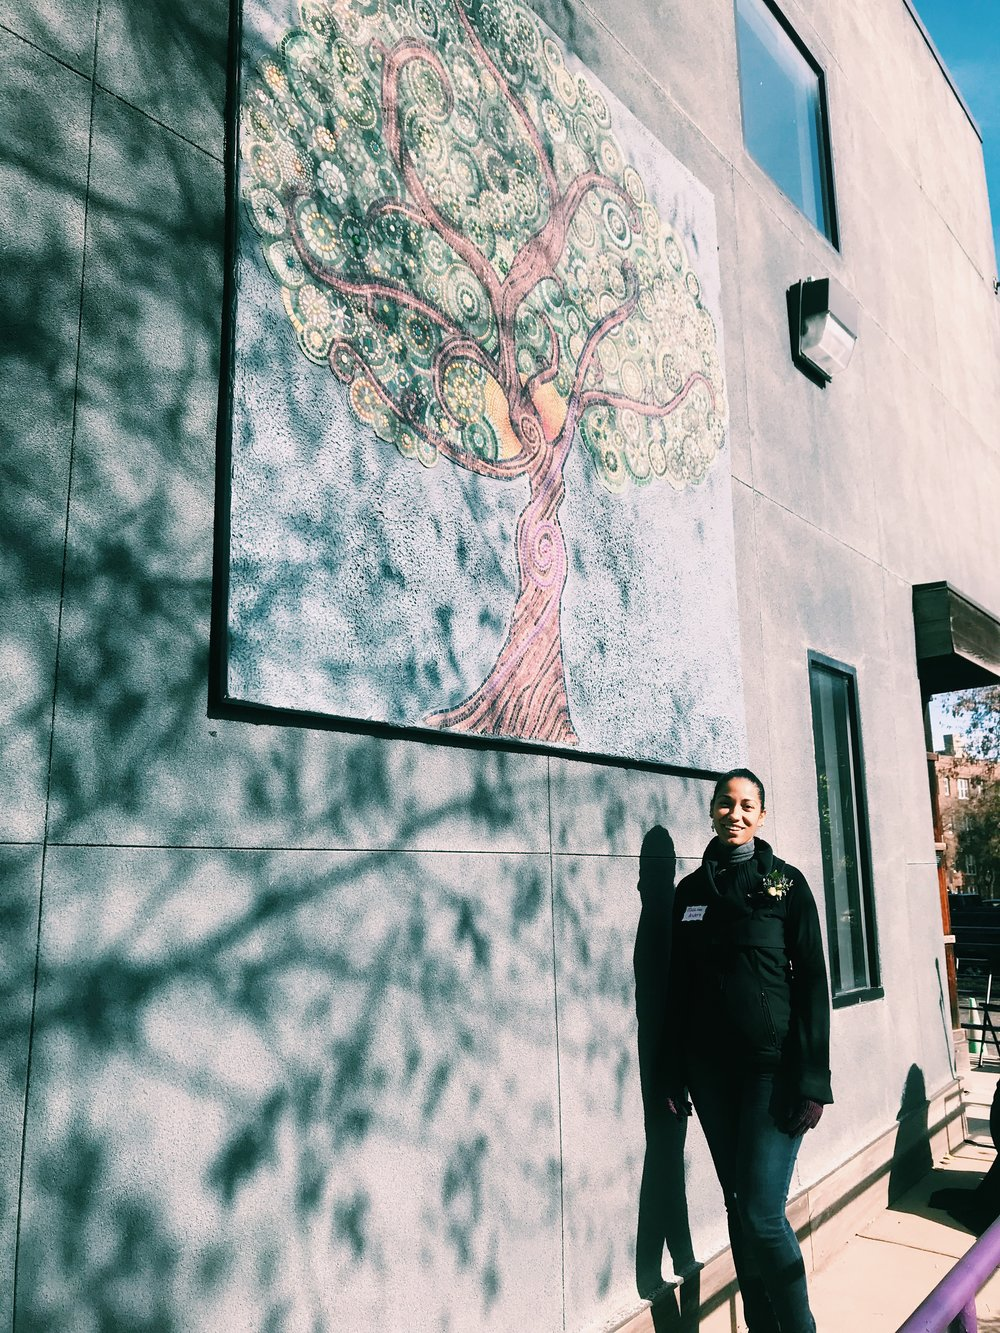 Tree Mosaic - by Mica Lee Anders and SPIP Community Members